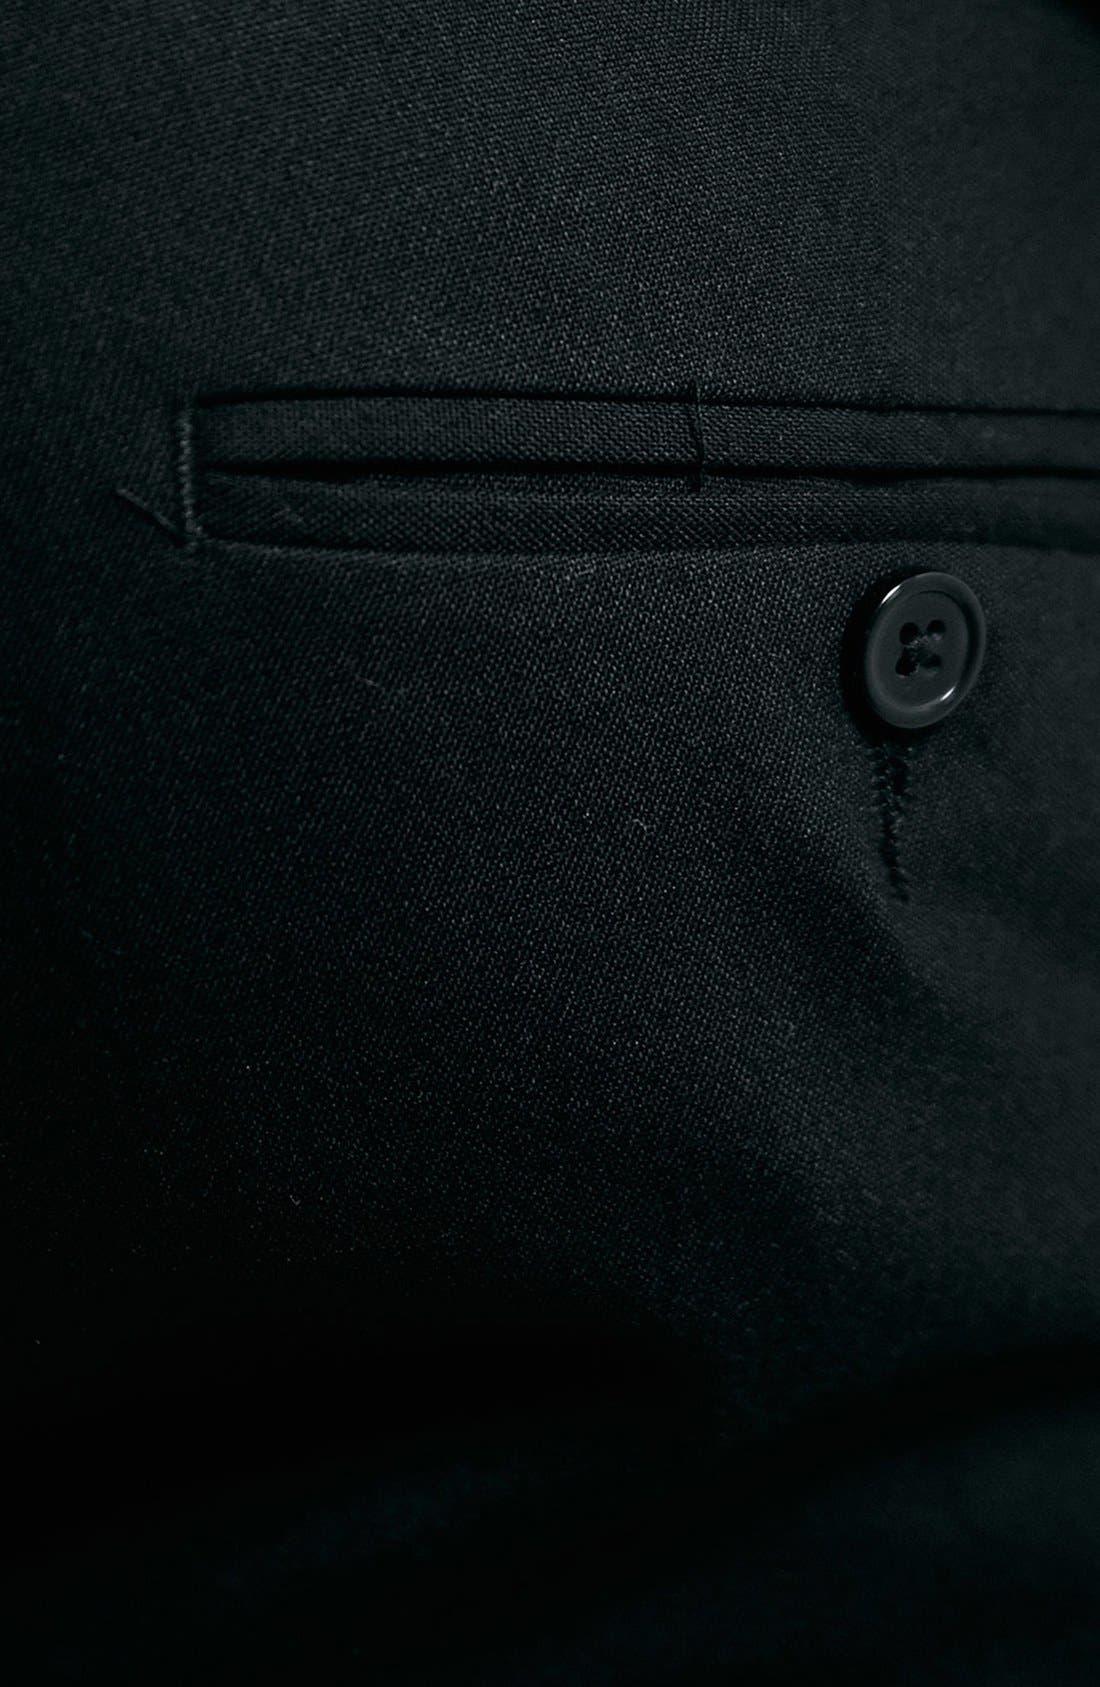 Ultra Skinny Black Suit Trousers,                             Alternate thumbnail 5, color,                             001